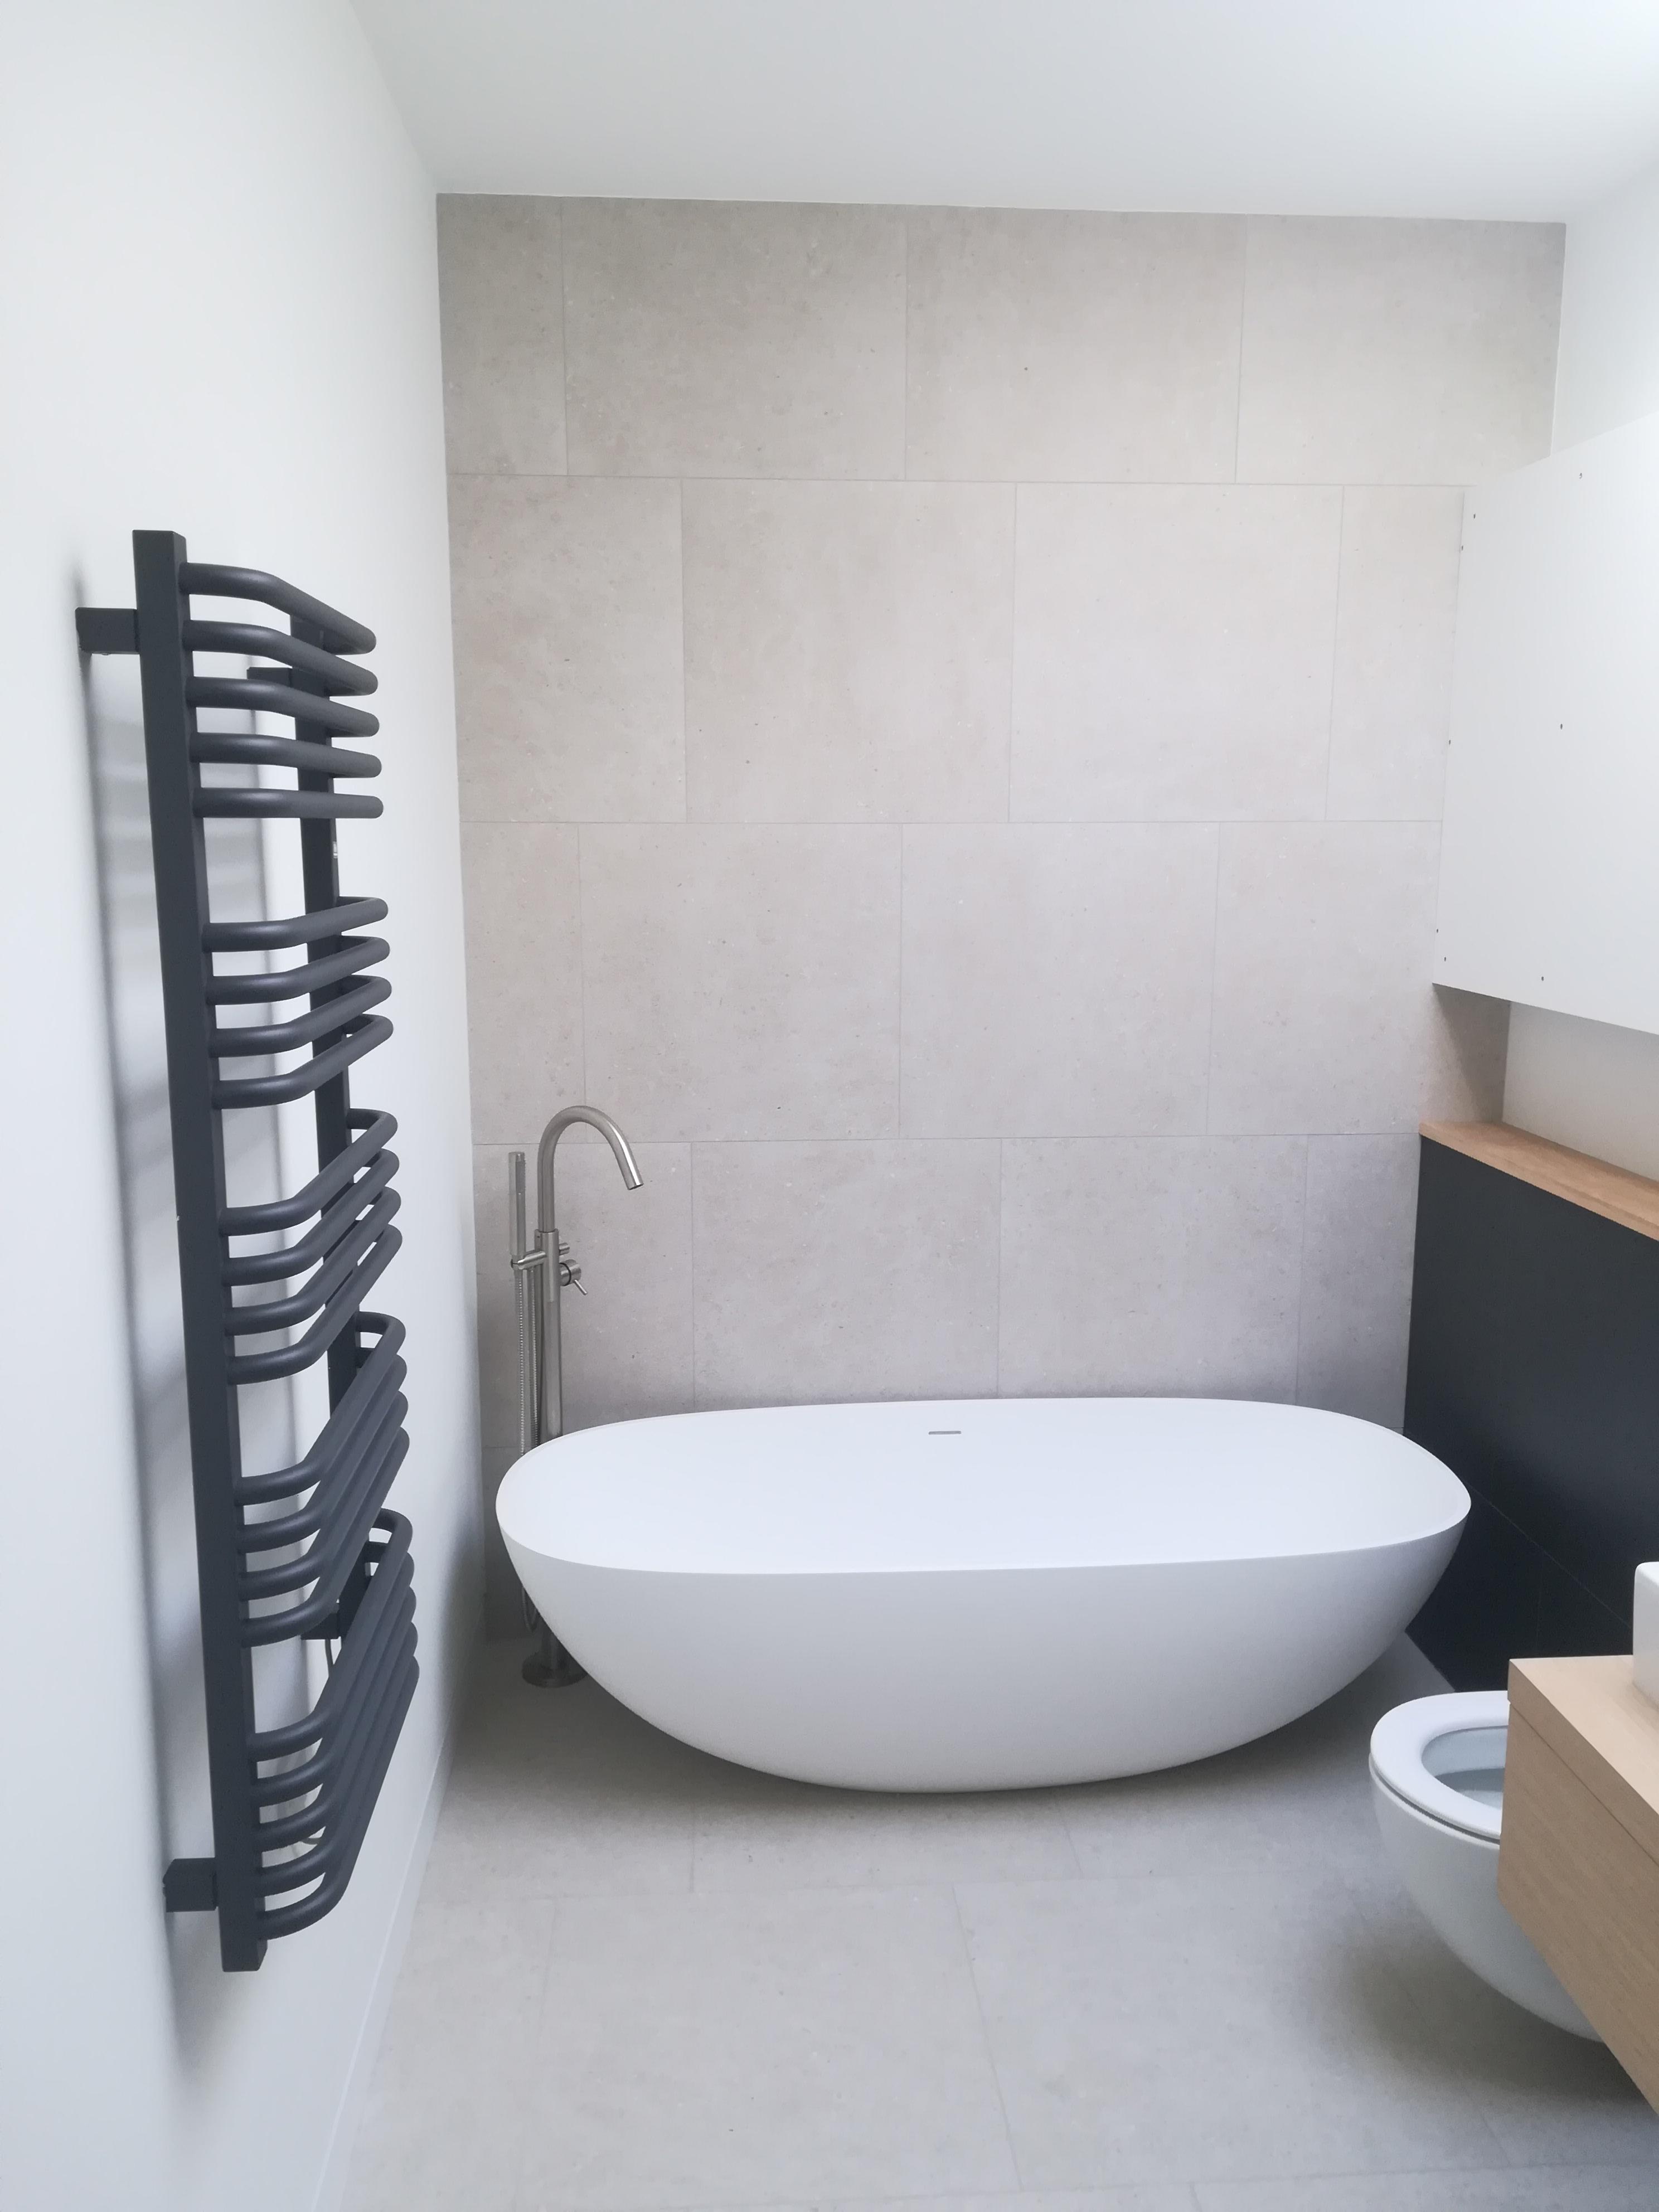 Bathroom floor tiling done in Isle of Wight in 2019